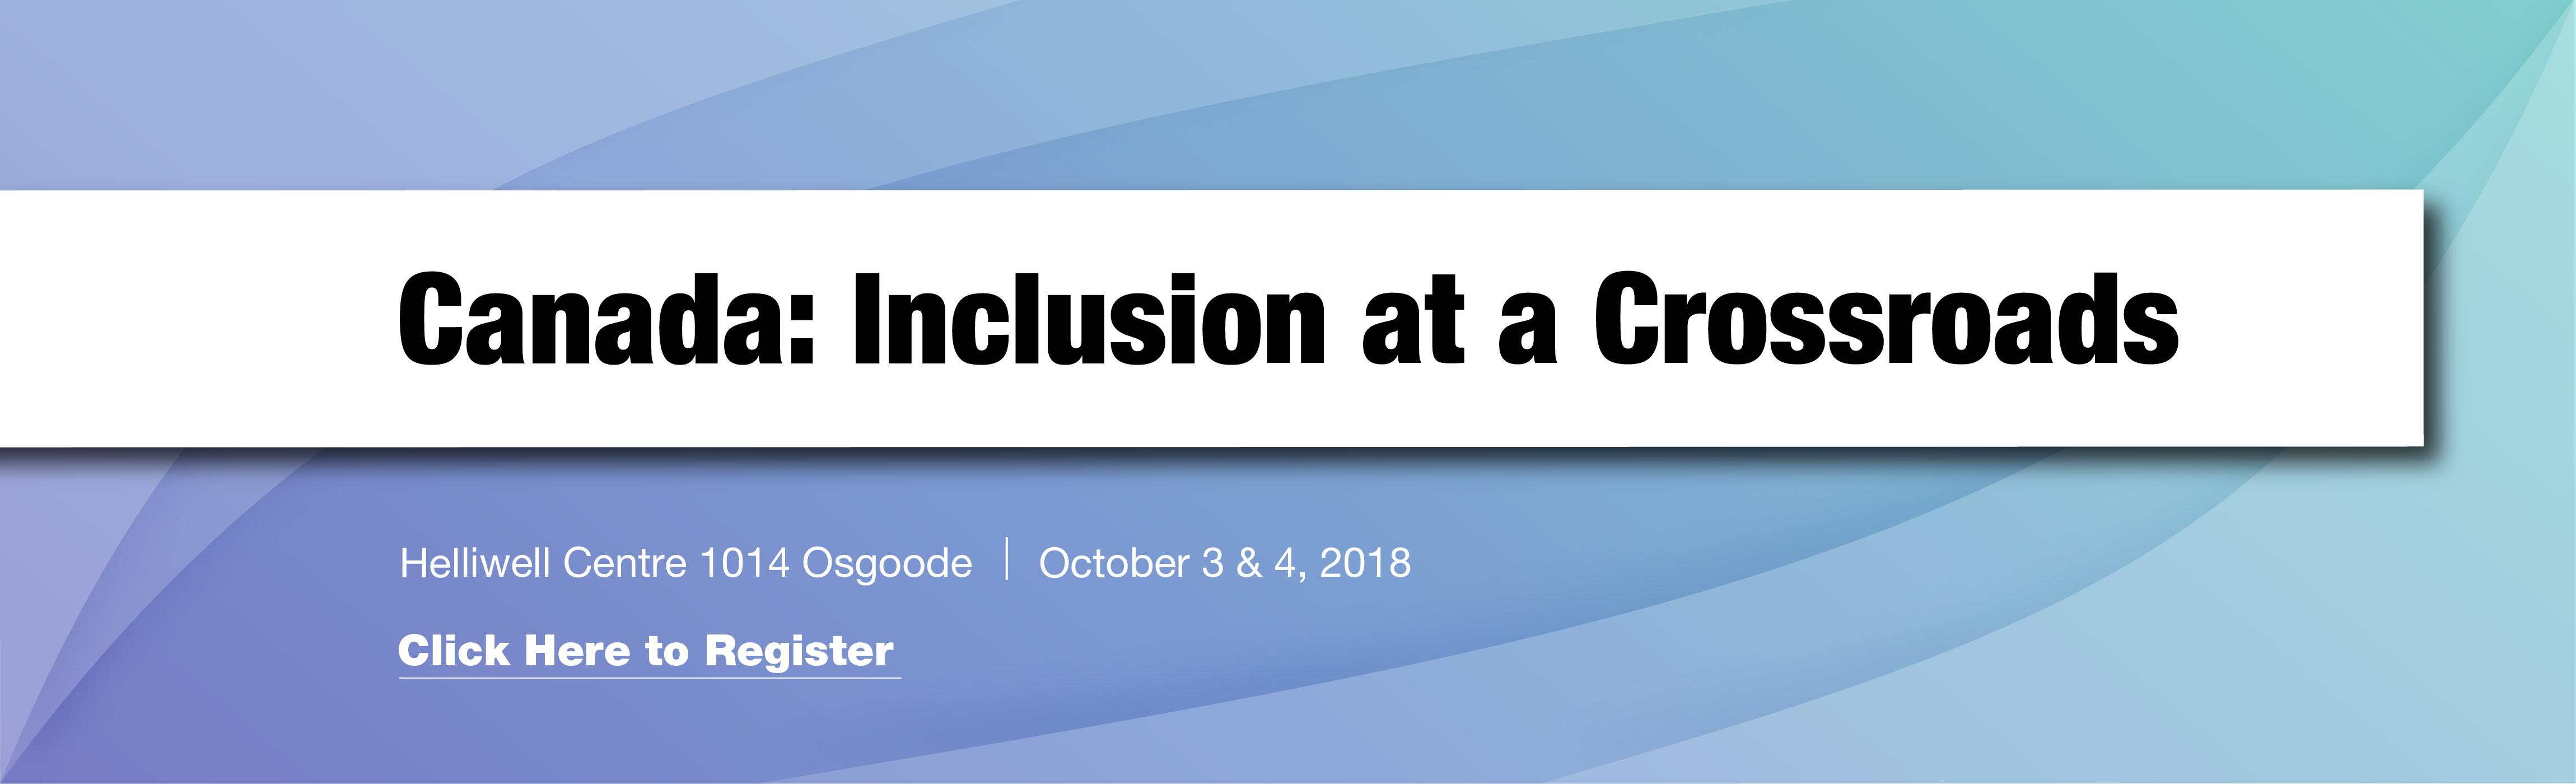 Canada: Inclusion at a Crossroads